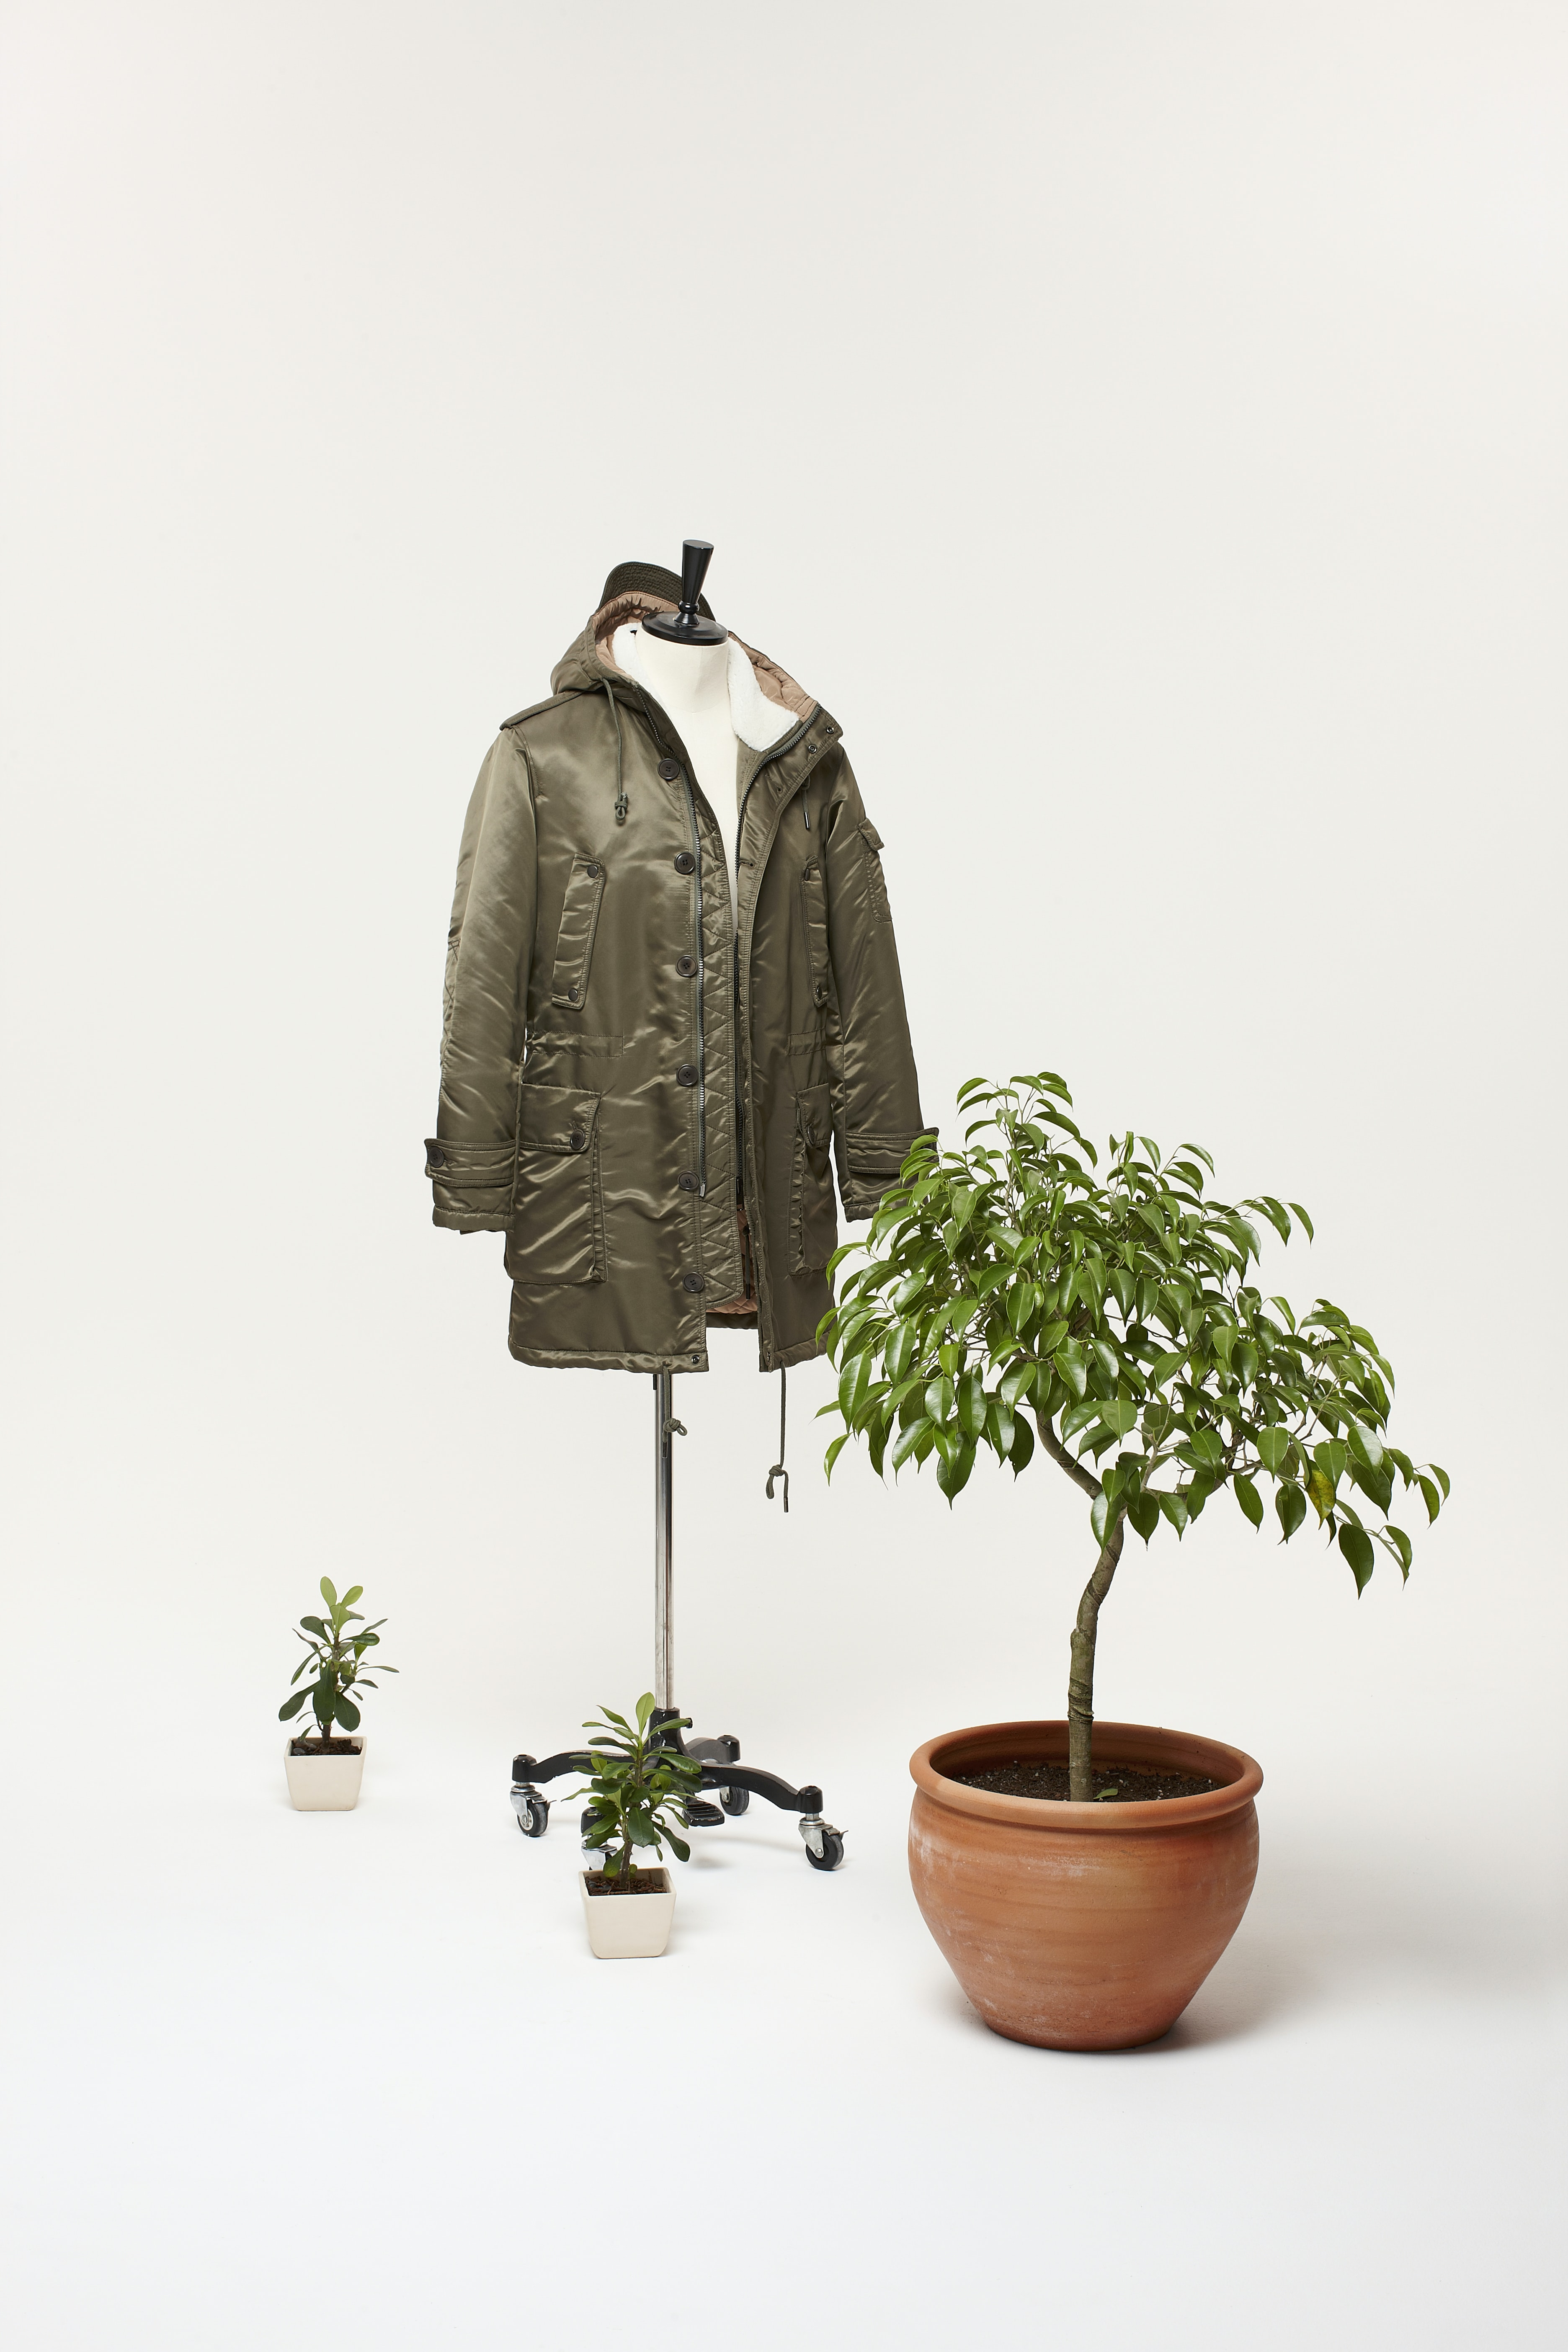 brown jacket beside green plant